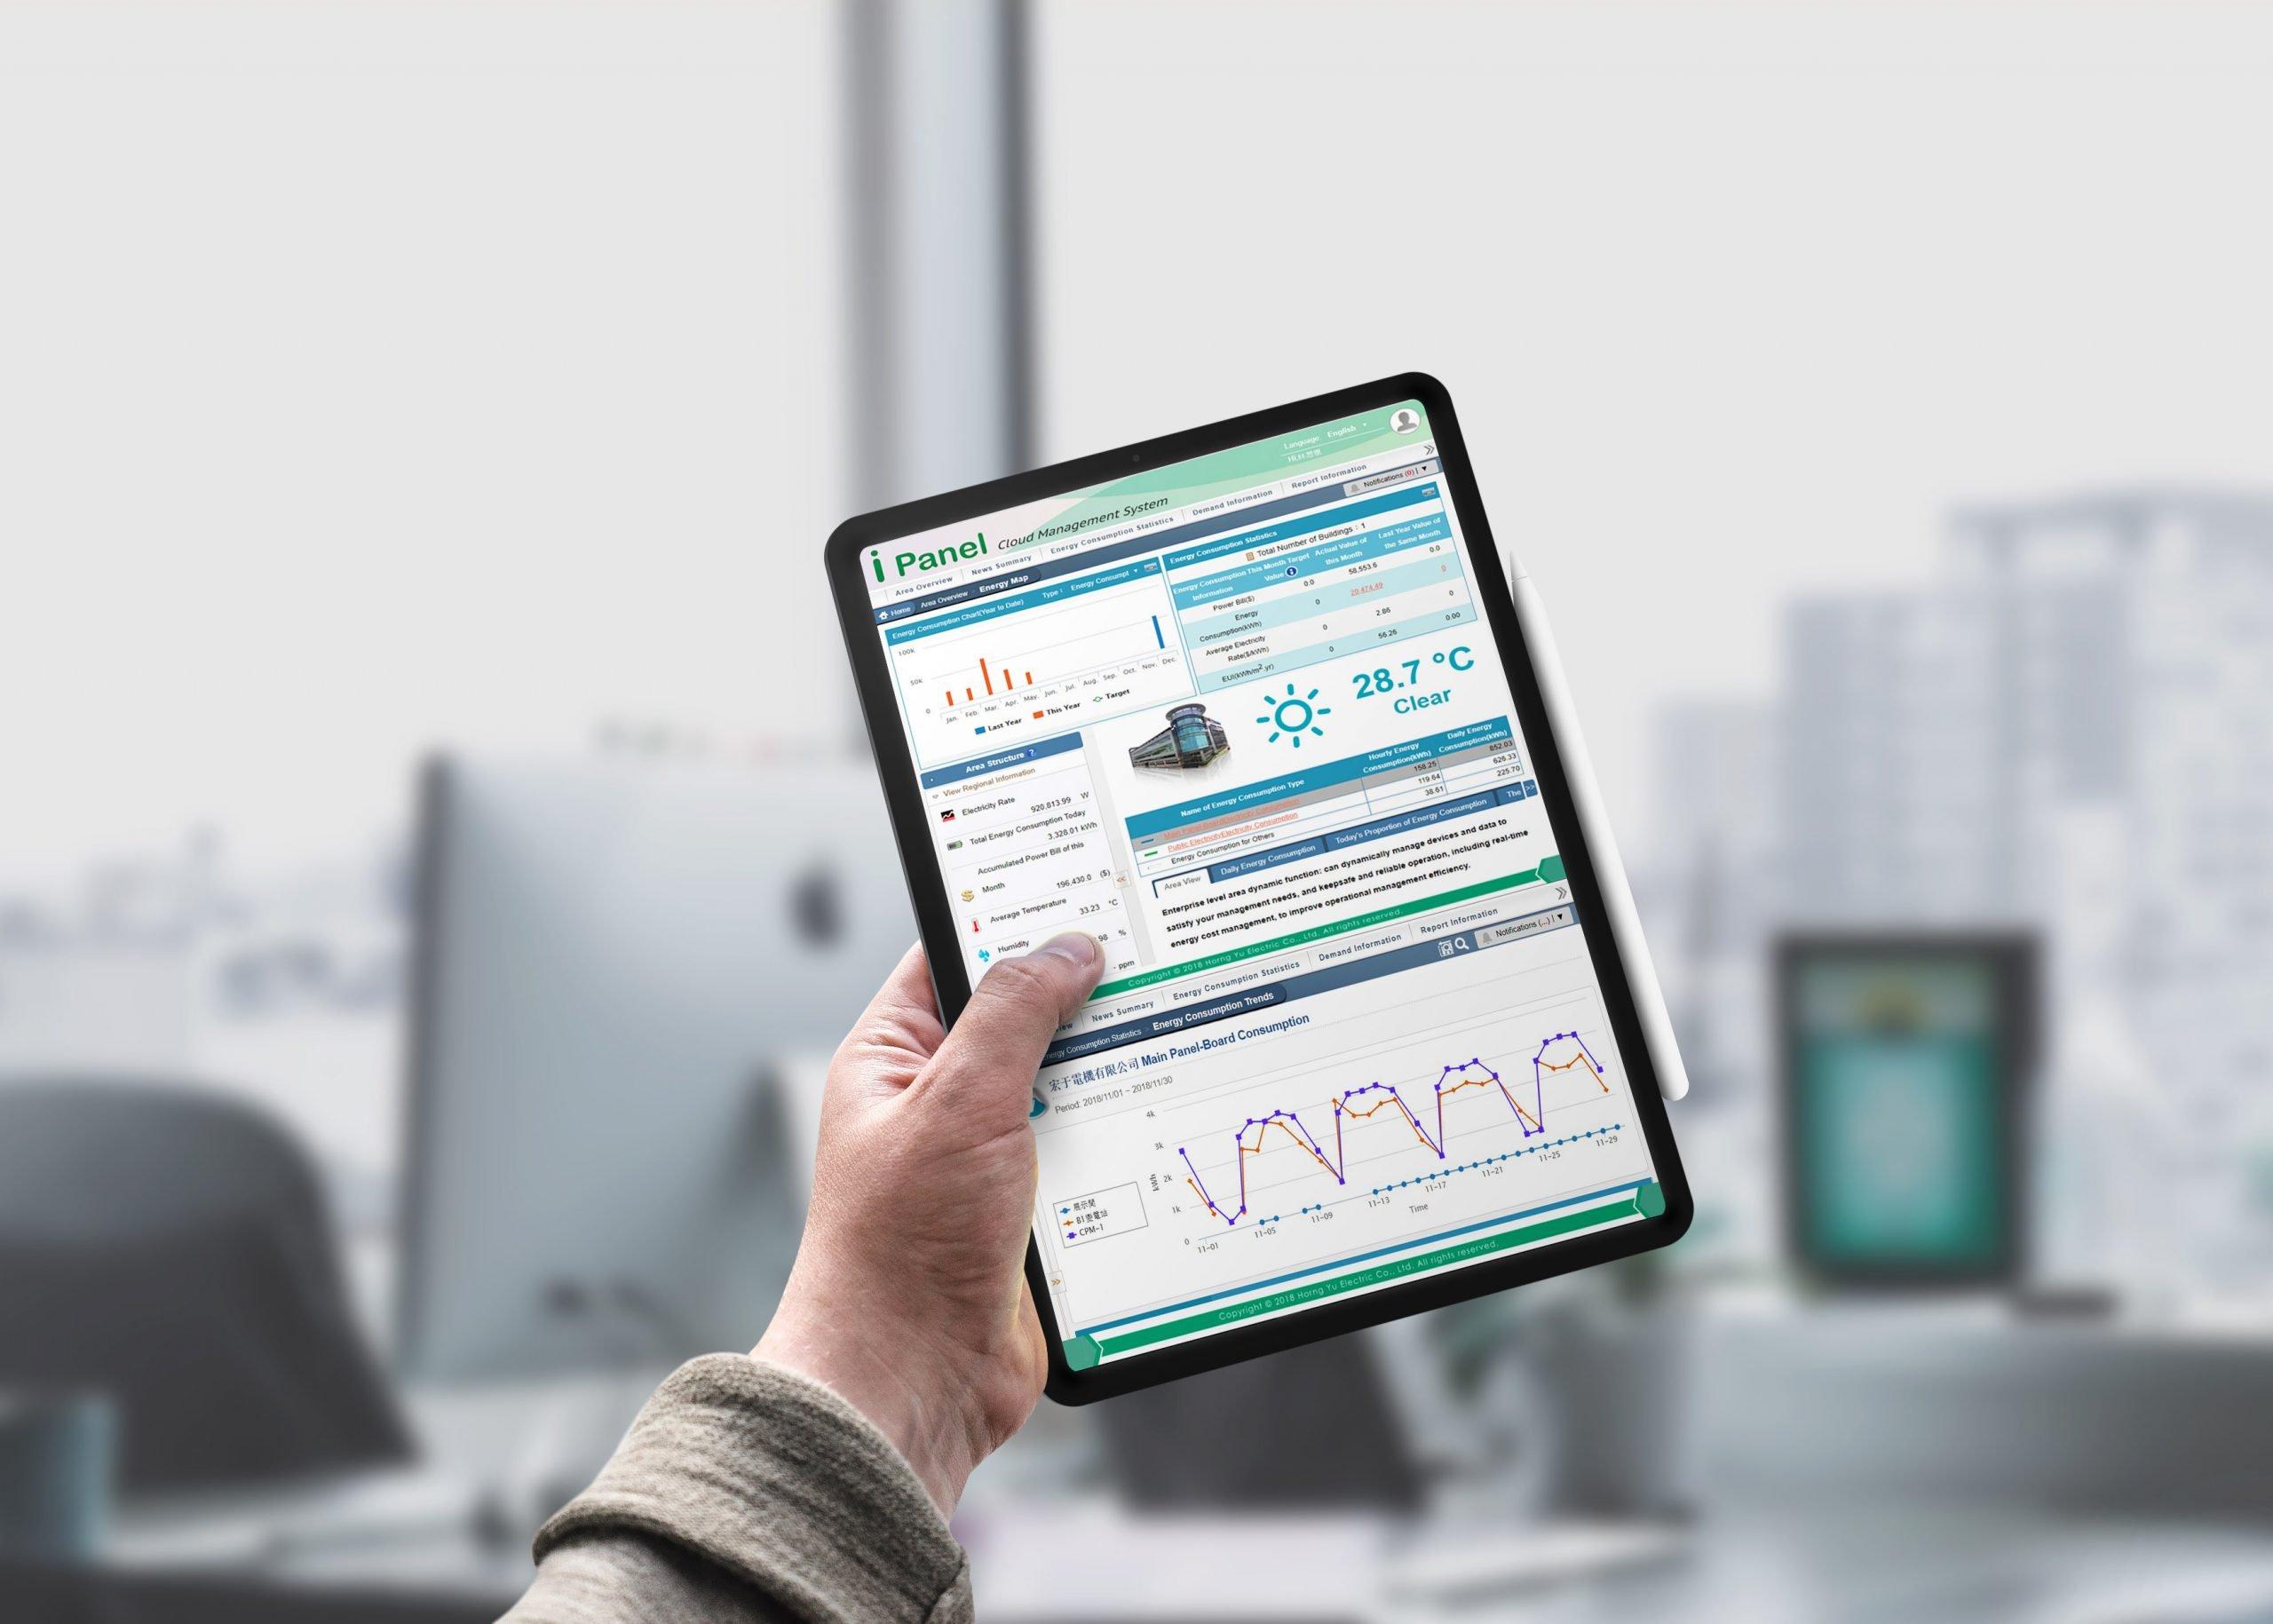 iPad-Pro-In-Hand-ipanel